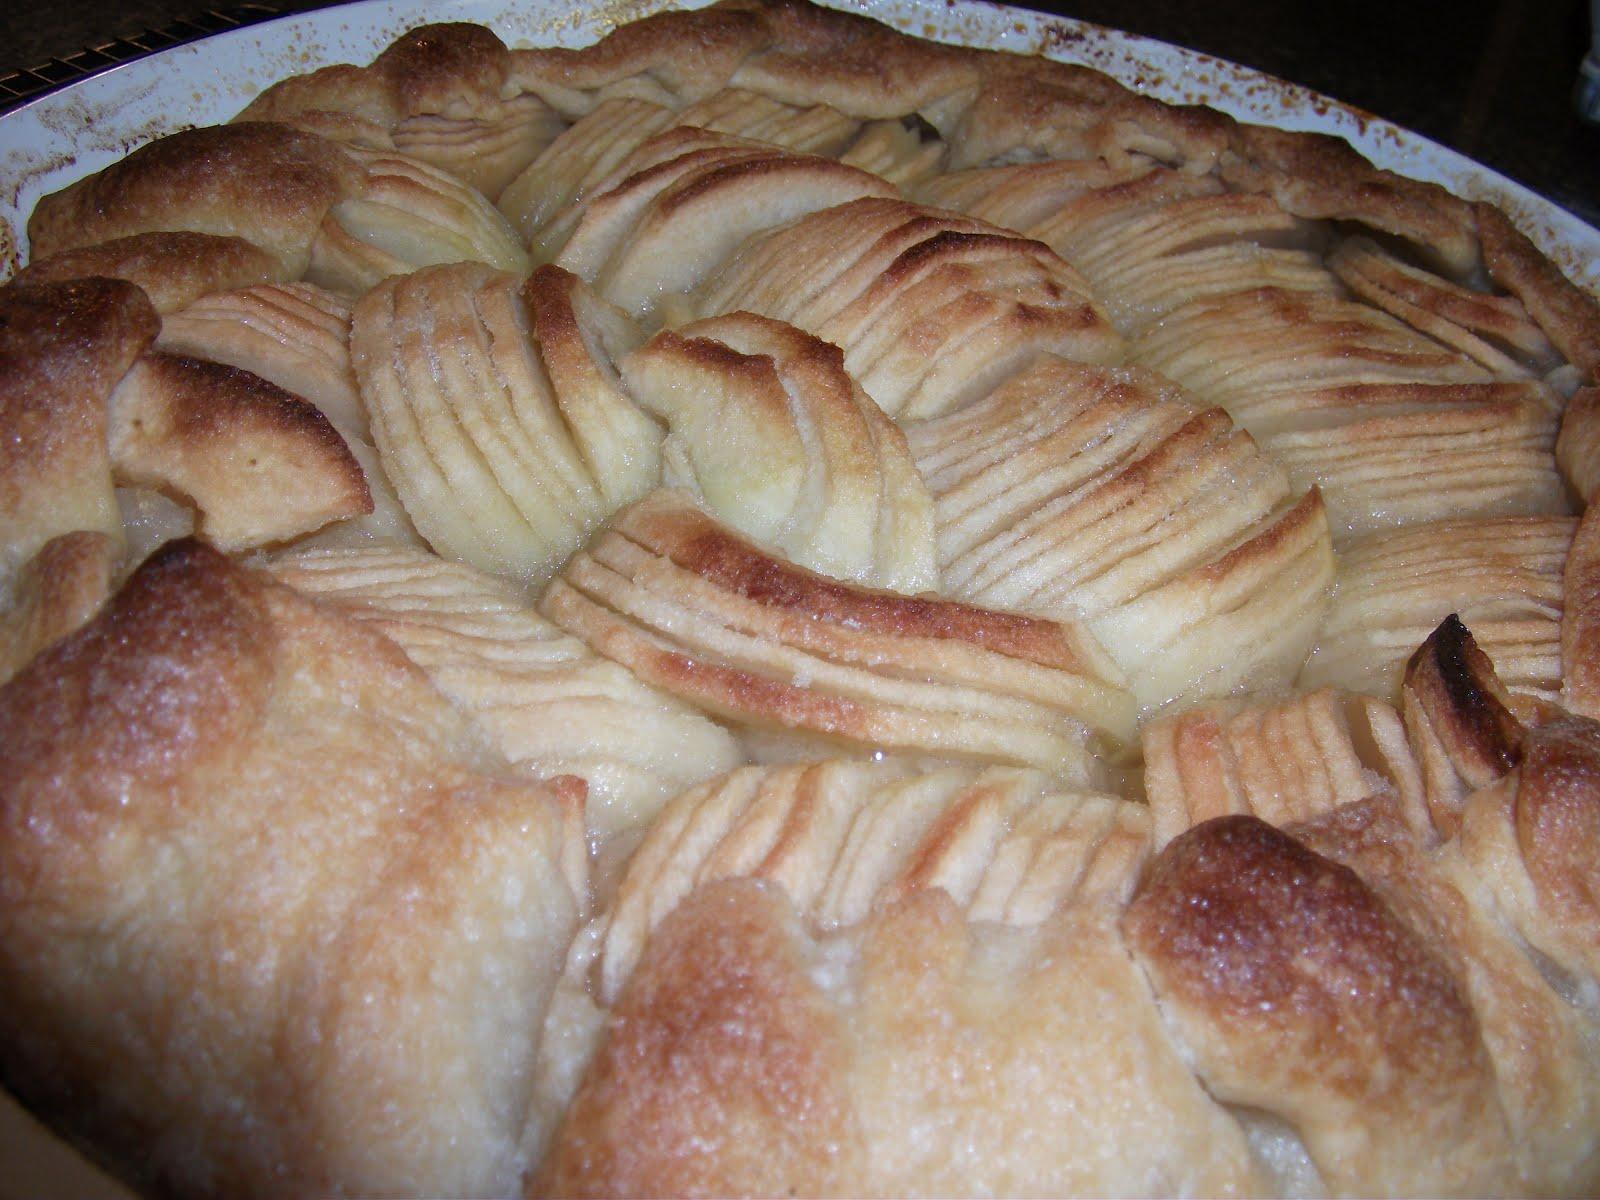 Nat's Adventures in Baking: Simple Apple Tart (★ ★ ★ ☆ ☆)